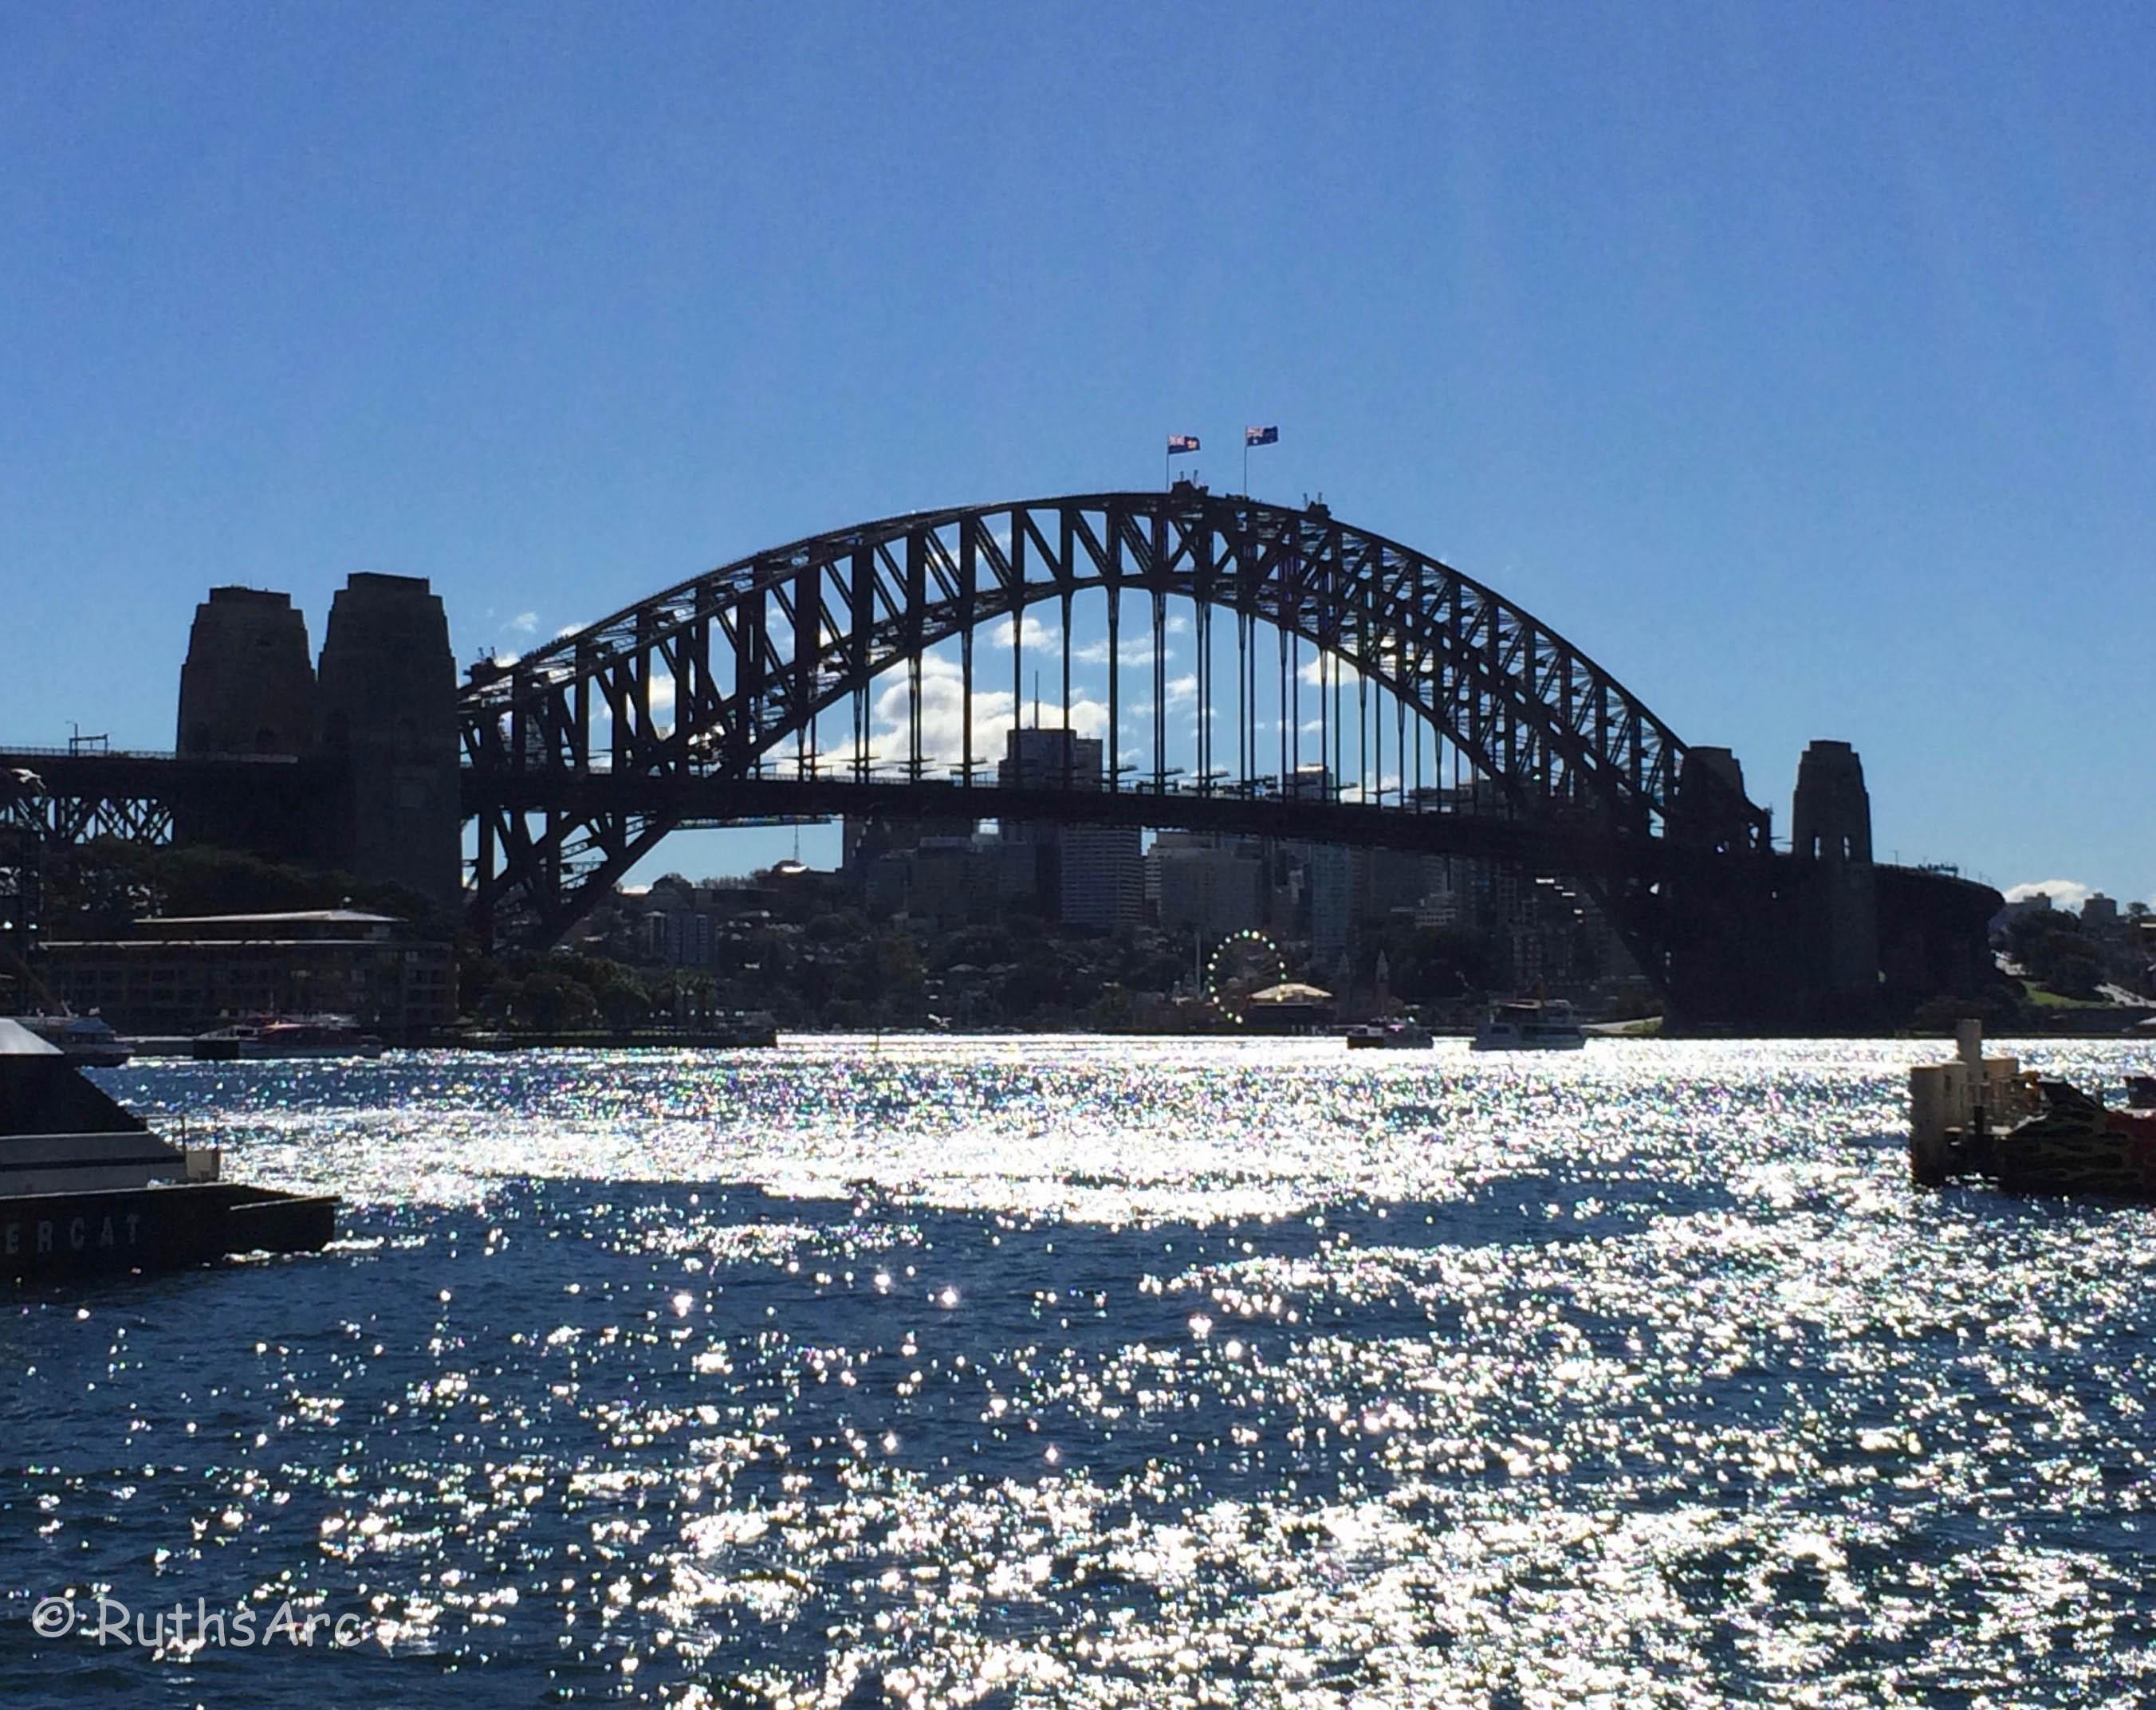 B Sydney